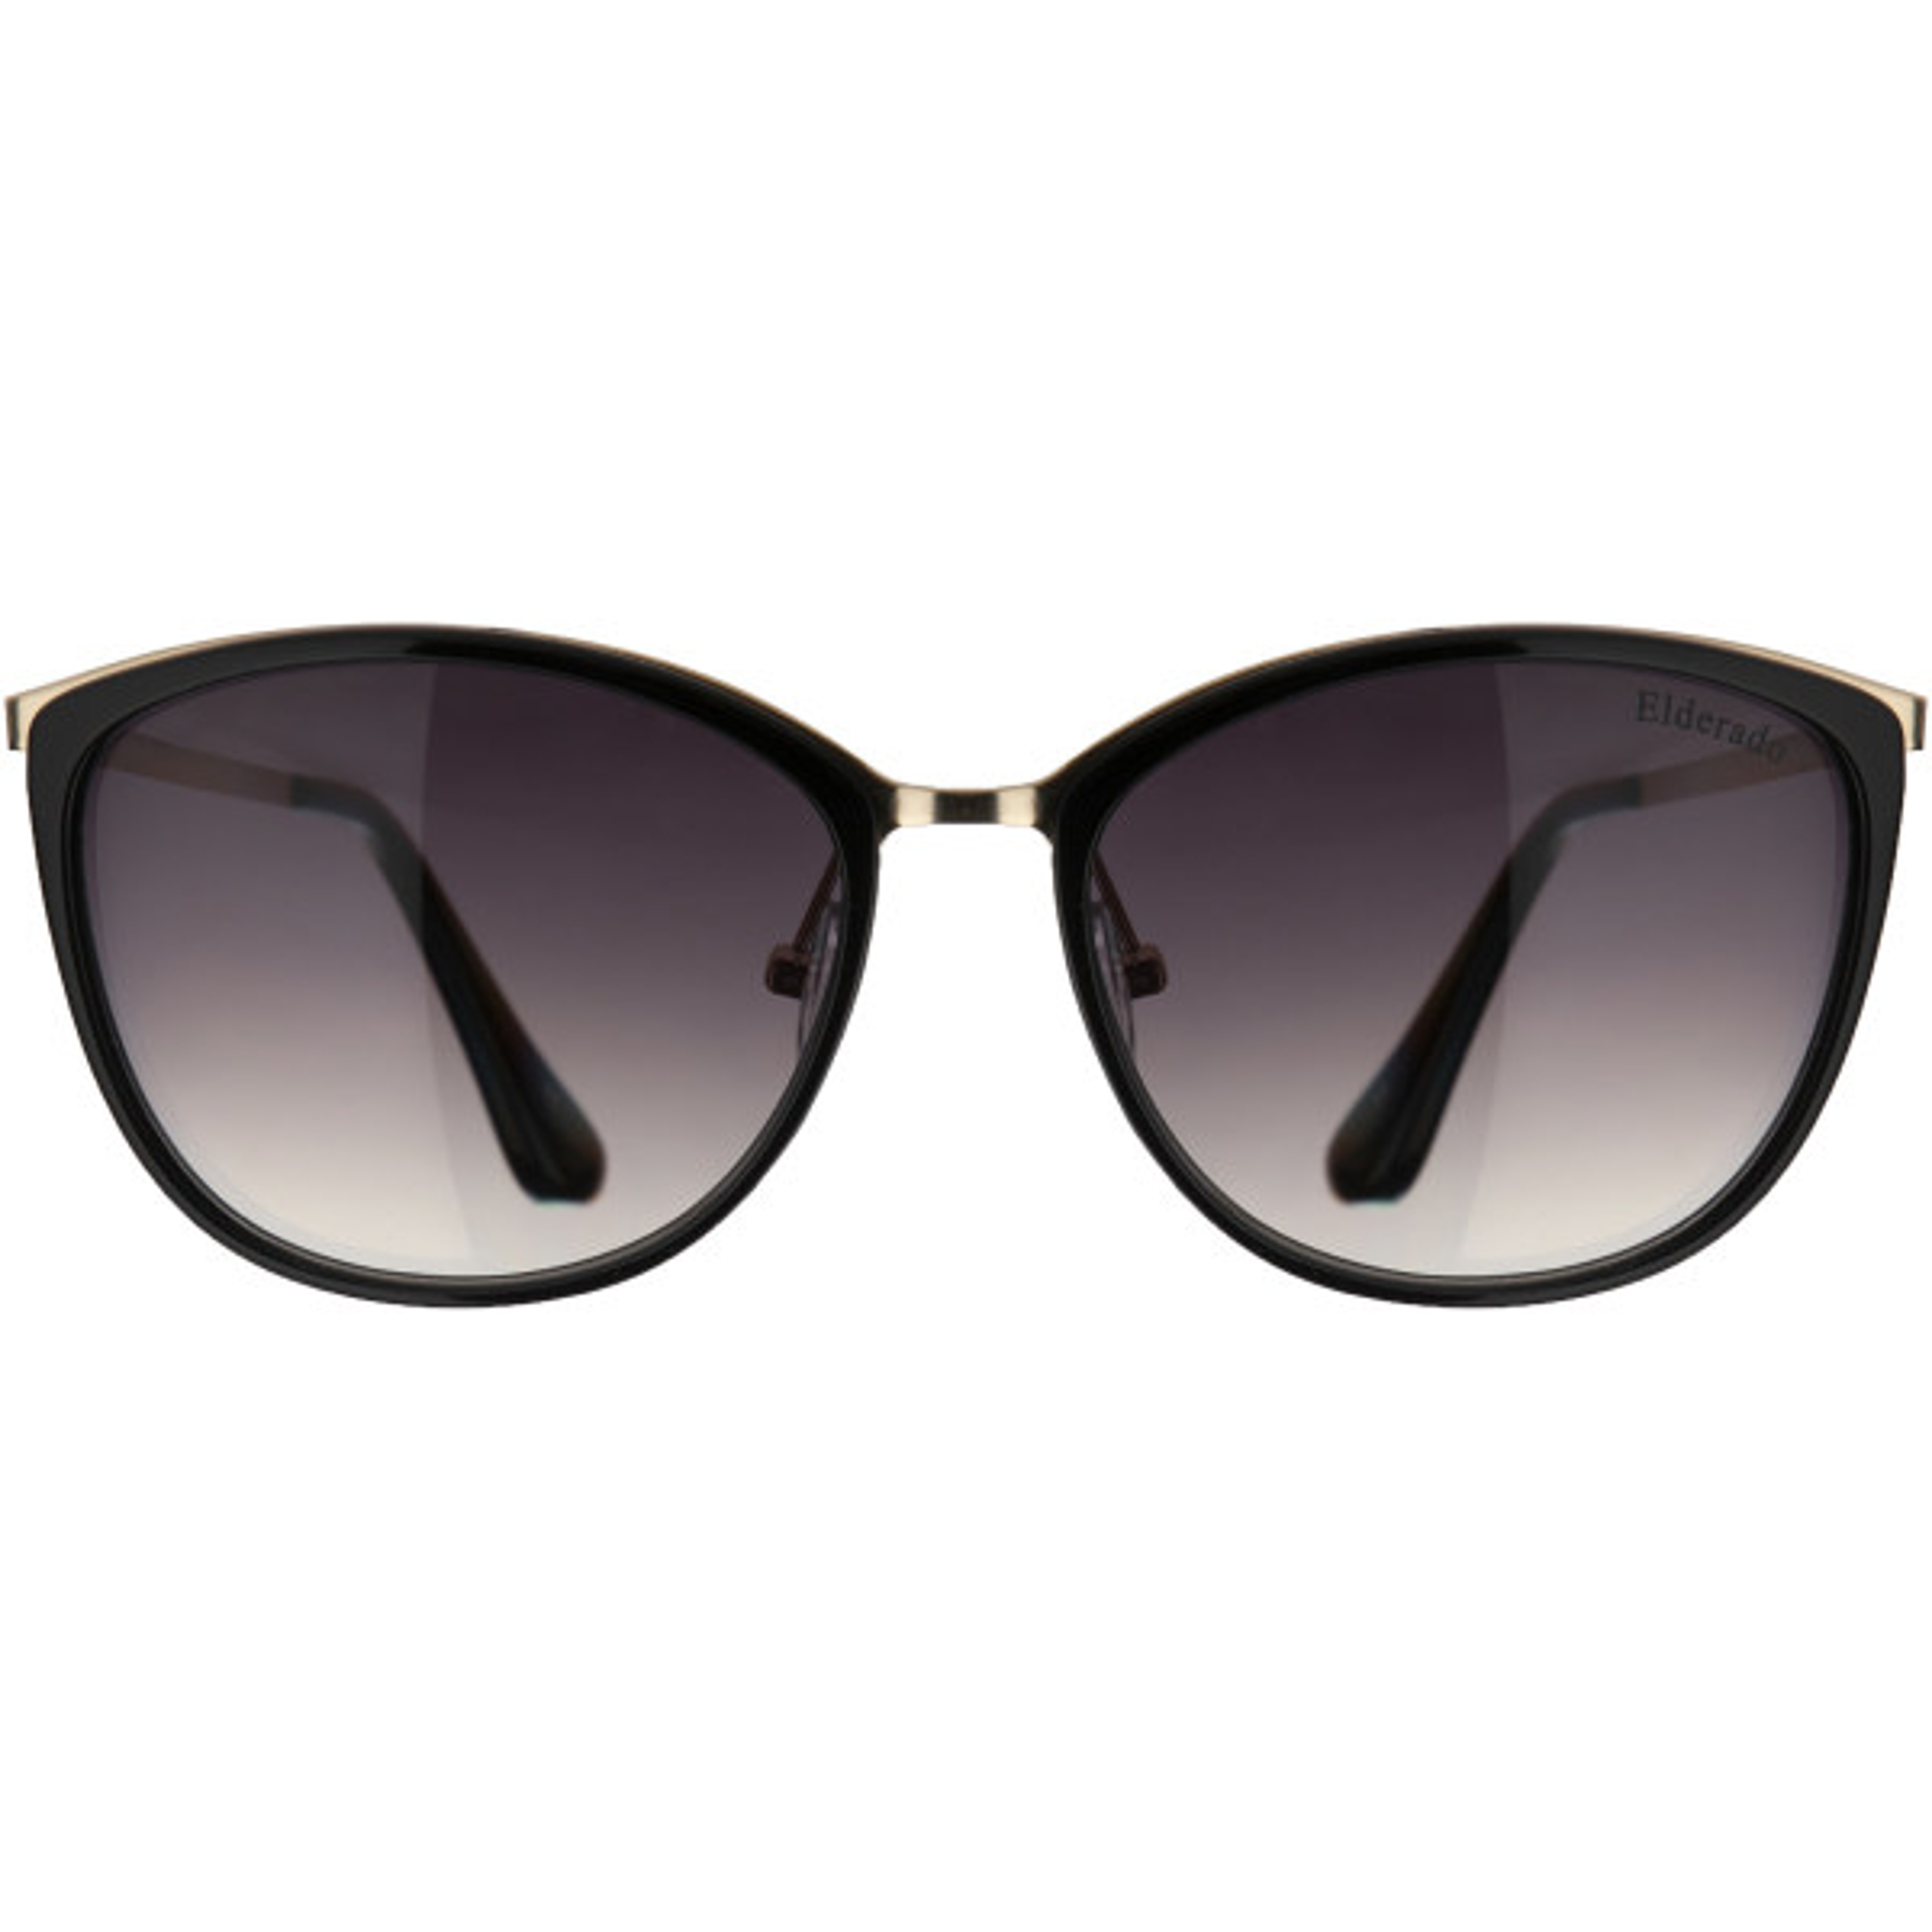 عینک افتابی زنانه الدورادو مدل 33